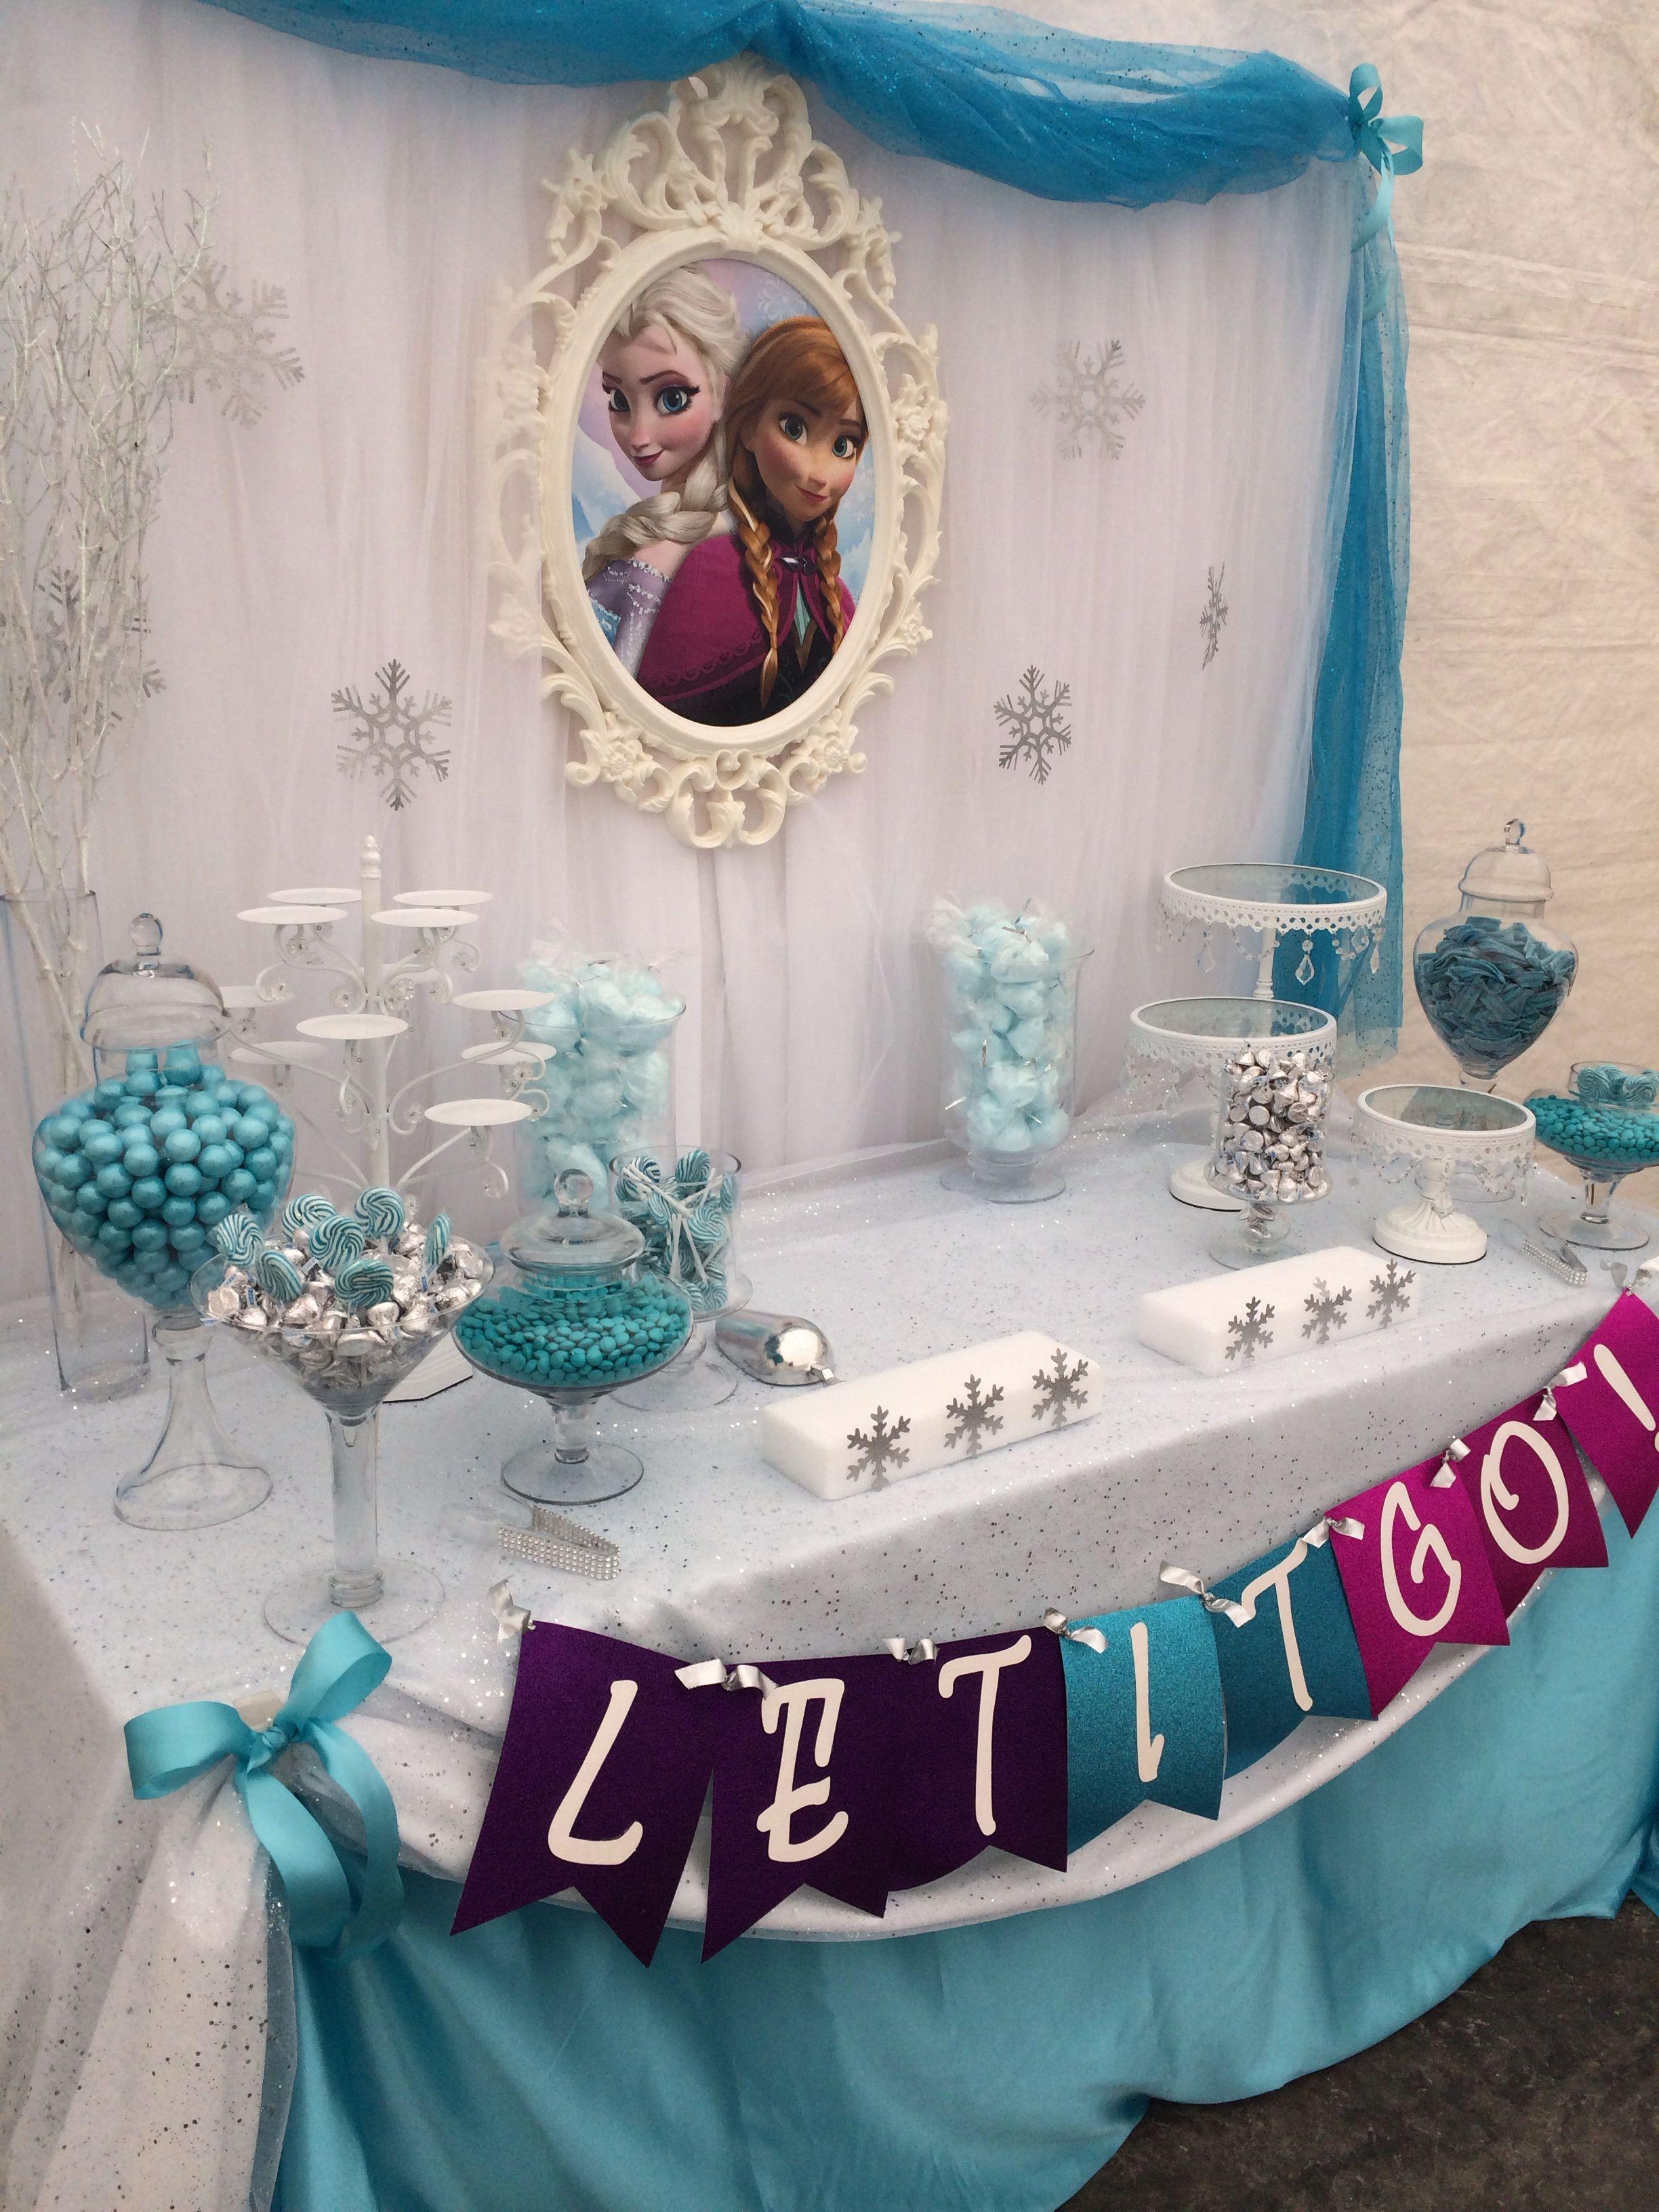 Fiesta De Cumpleanos Frozen 101 Ideas Originales Frozen Tea Party Frozen Theme Party Frozen Birthday Theme